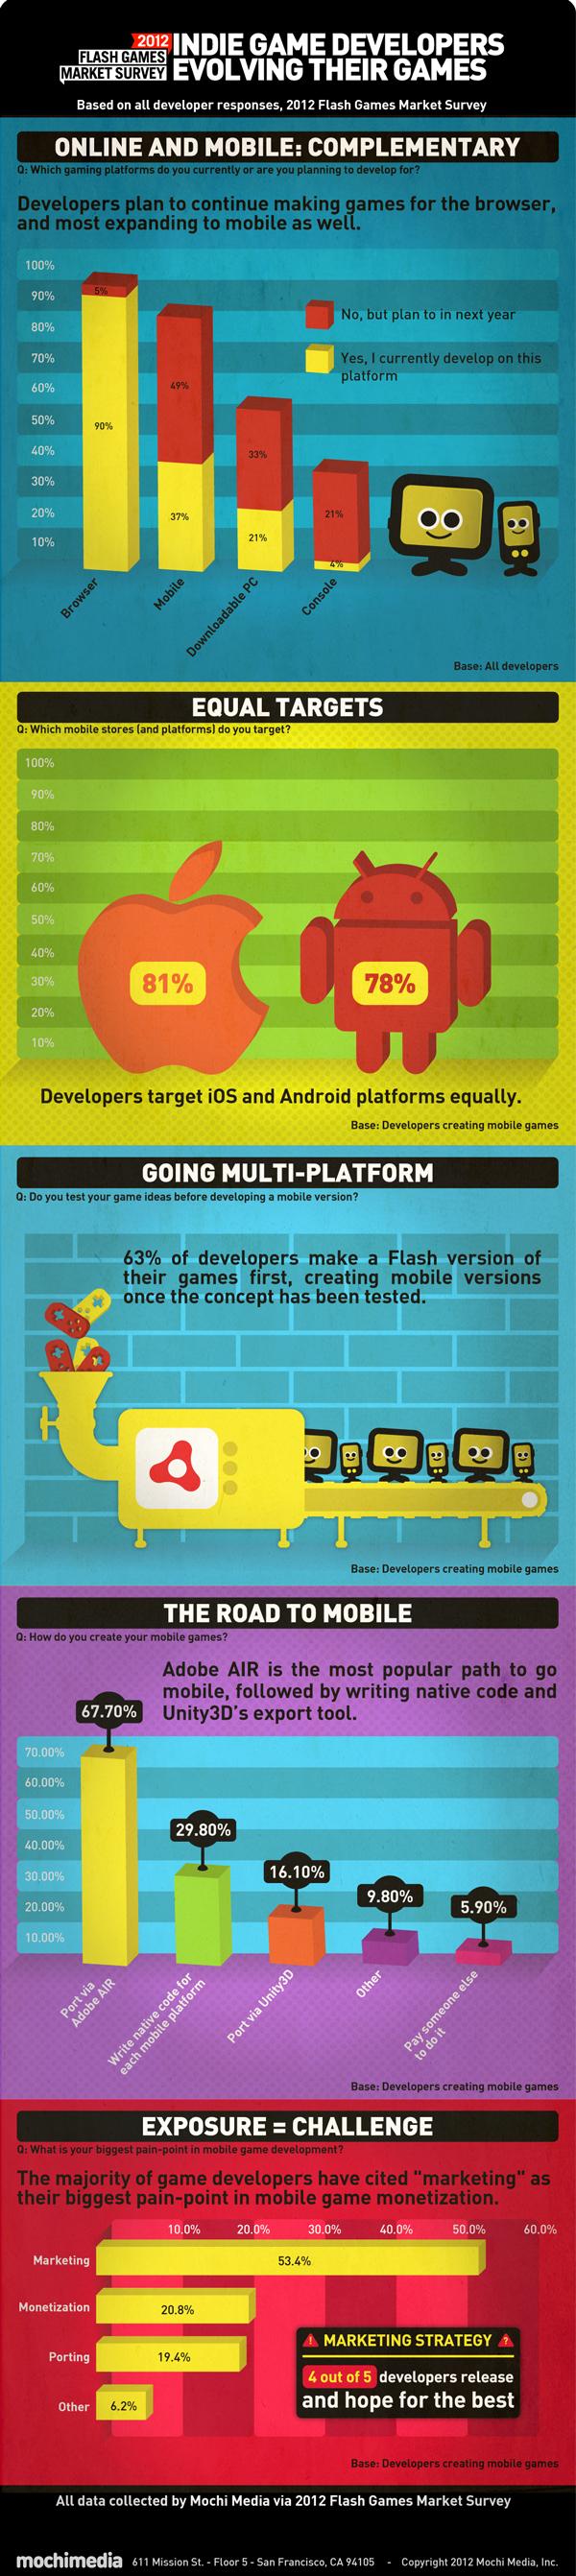 mochi long infographic